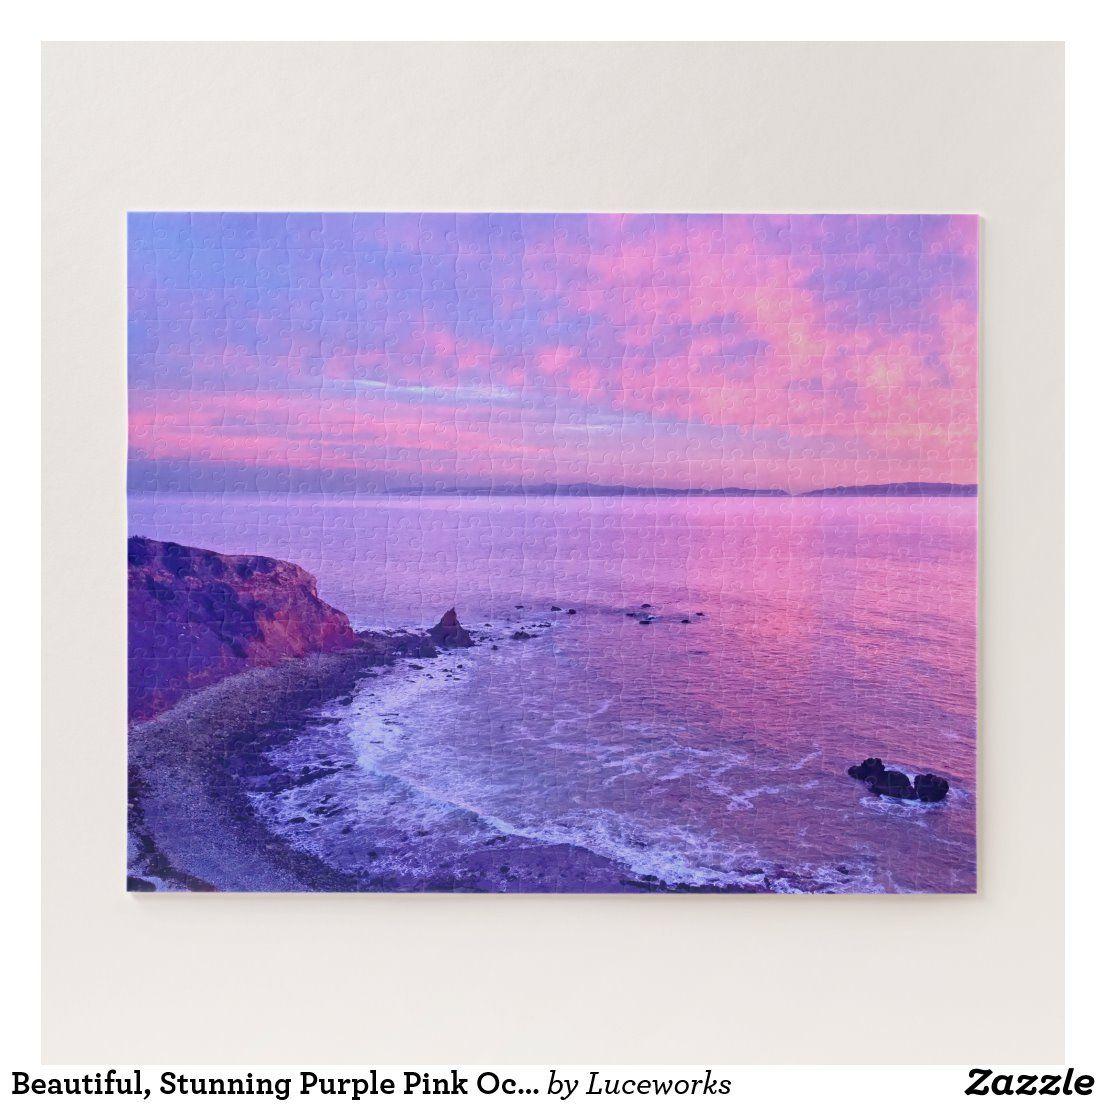 Beautiful Stunning Purple Pink Ocean Sunset Photo Jigsaw Puzzle Zazzle Com In 2020 Sunset Painting Ocean Sunset Pink Ocean